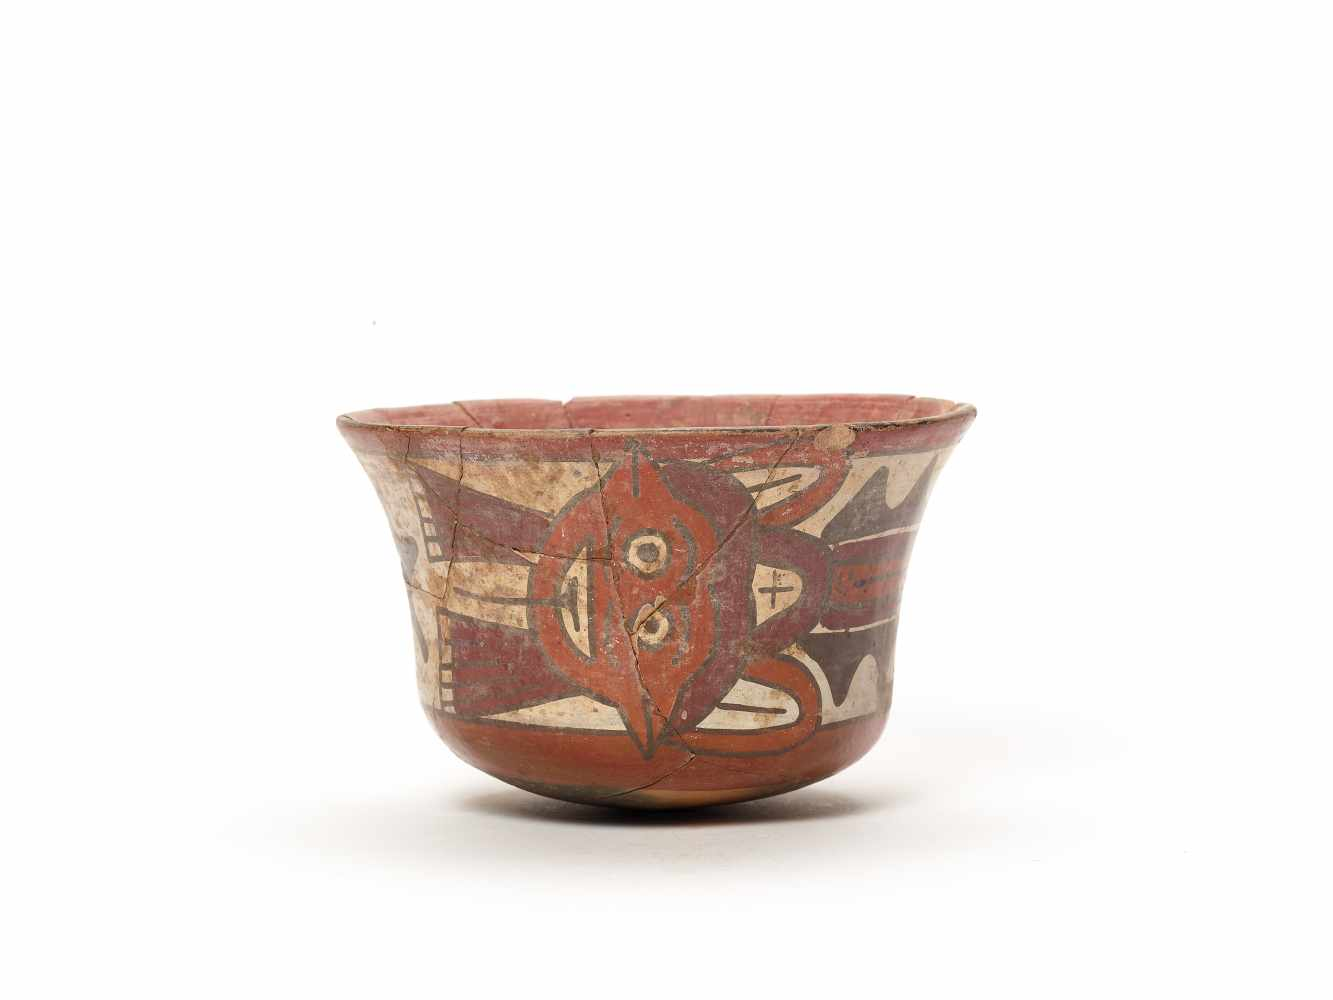 BOWL WITH GOD REPRESENTATION - NAZCA, PERU, C. 300-600 ADPainted clayNazca, Peru, c. 300-600